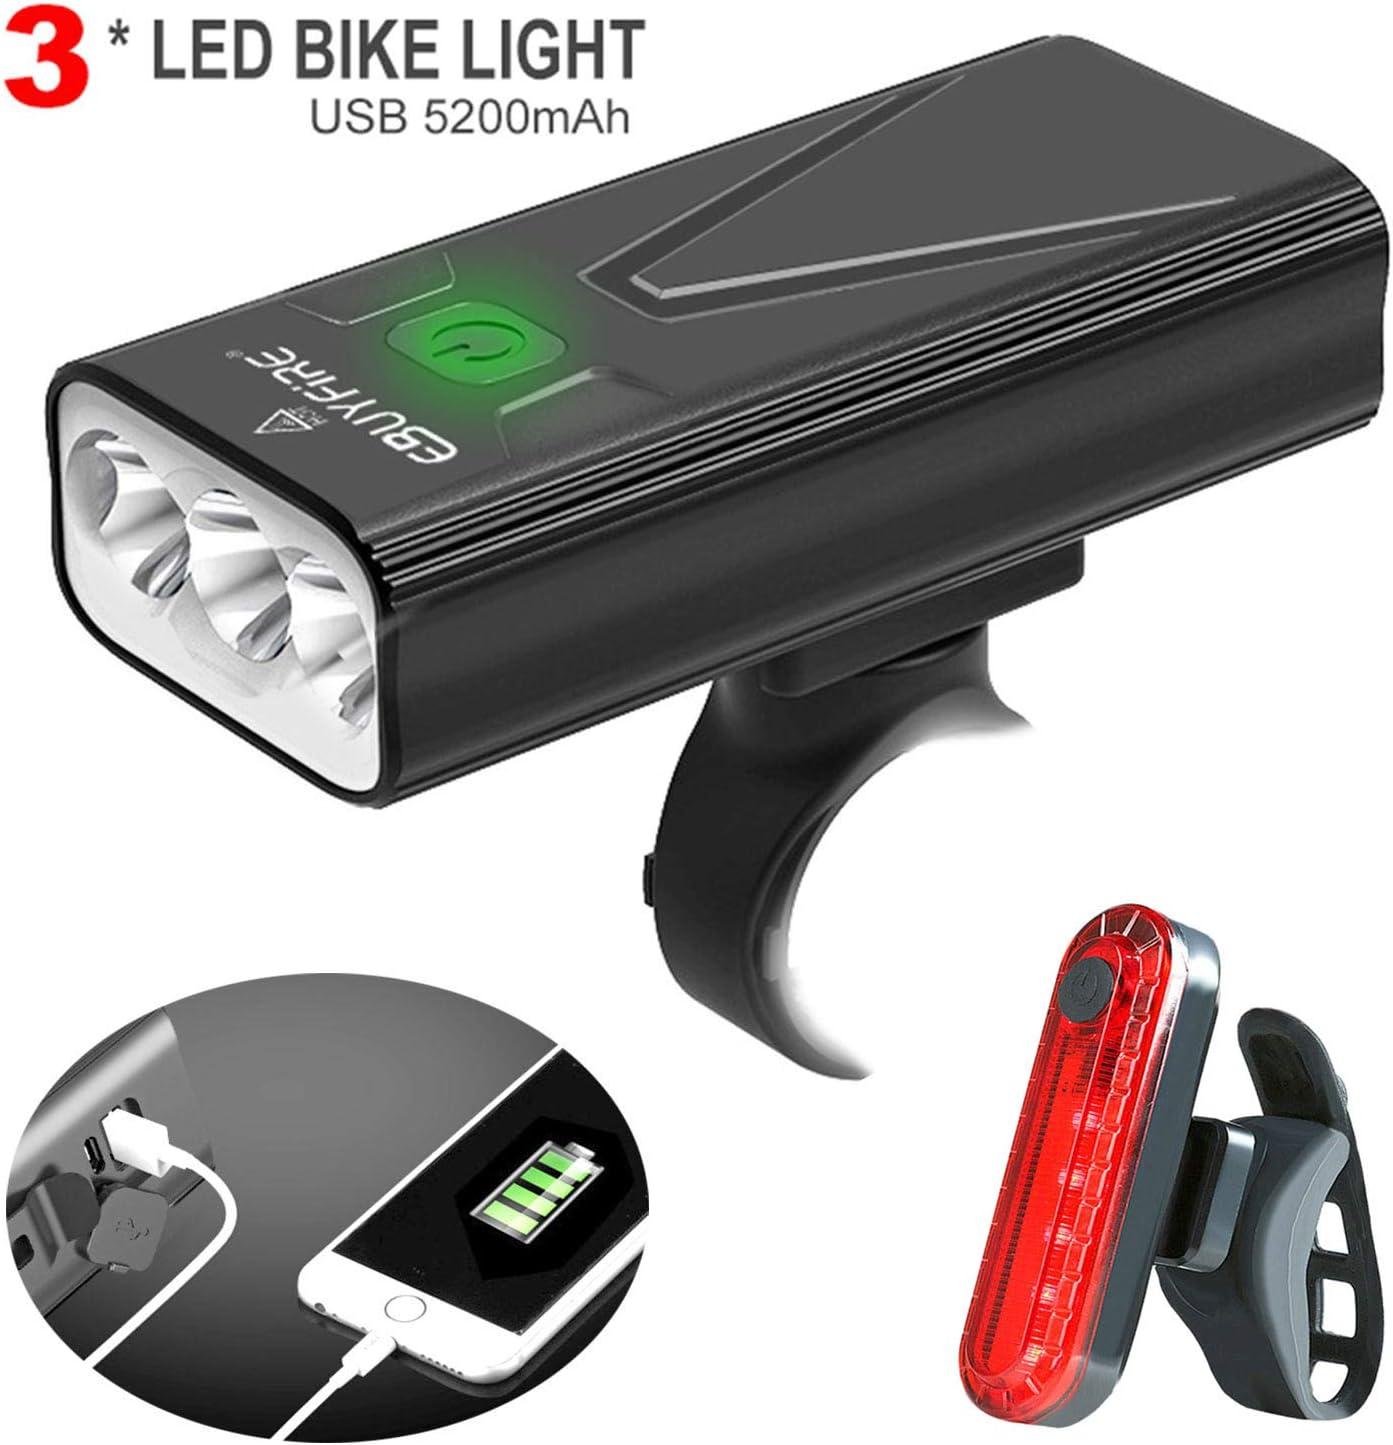 EBUYFIRE Luz Bicicleta LED Recargable USB, 3000 Lumens 5200 mAh Potente Luces Bicicleta Delantera y Trasera, 3 Modos, IPX5 Impermeable Luces Seguridad para Ciclismo de Montaña y Carretera